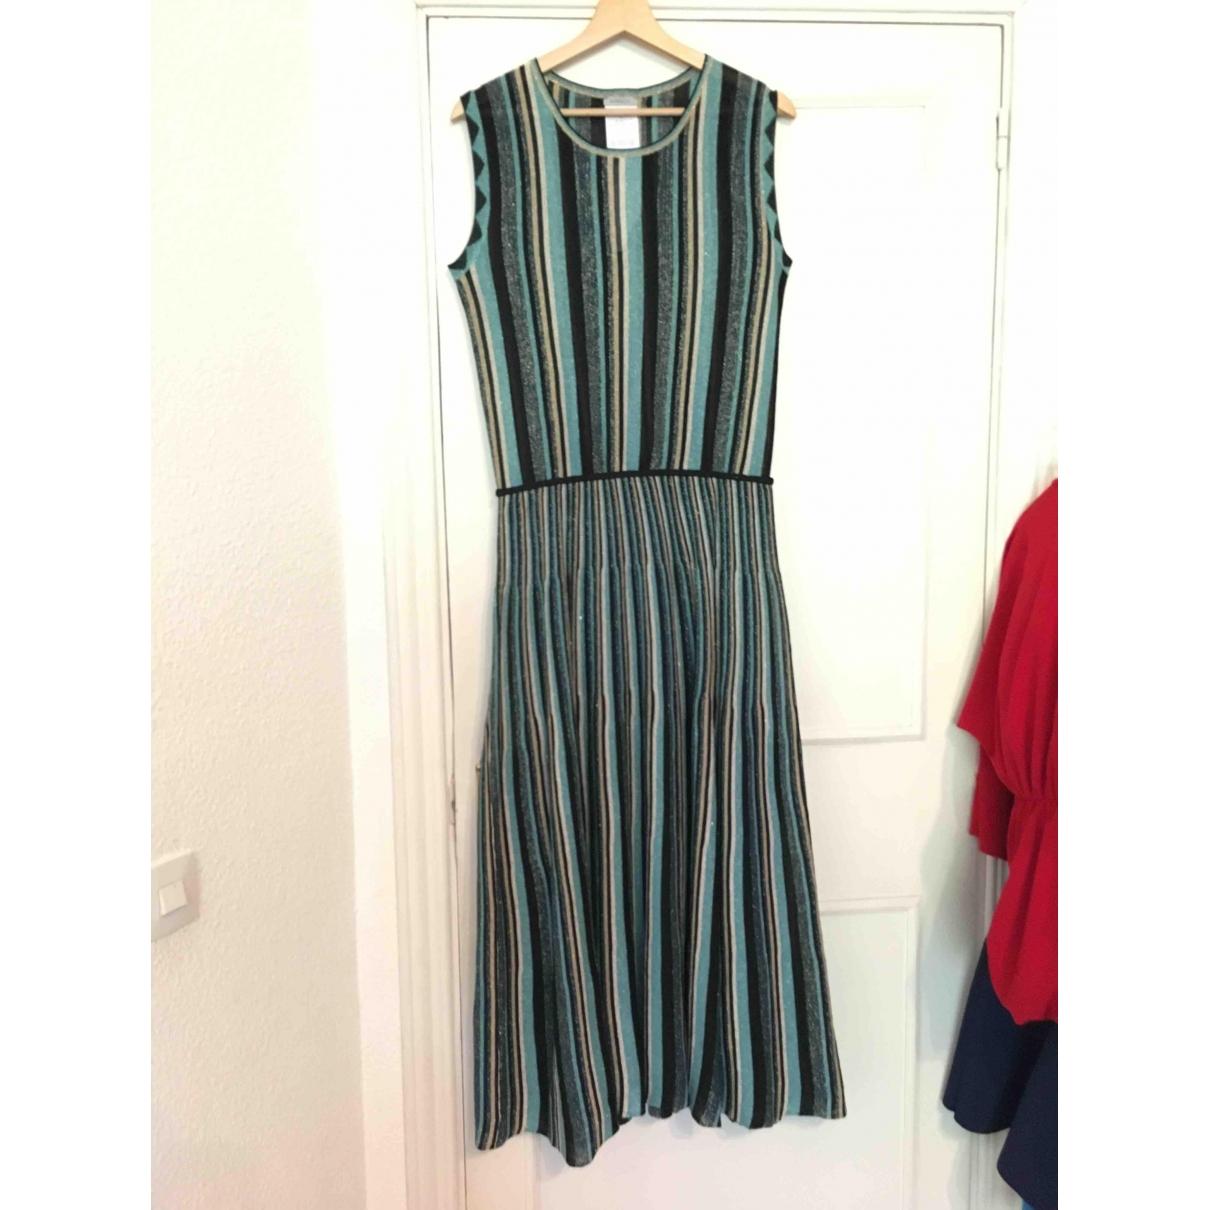 Marella \N Multicolour dress for Women M International